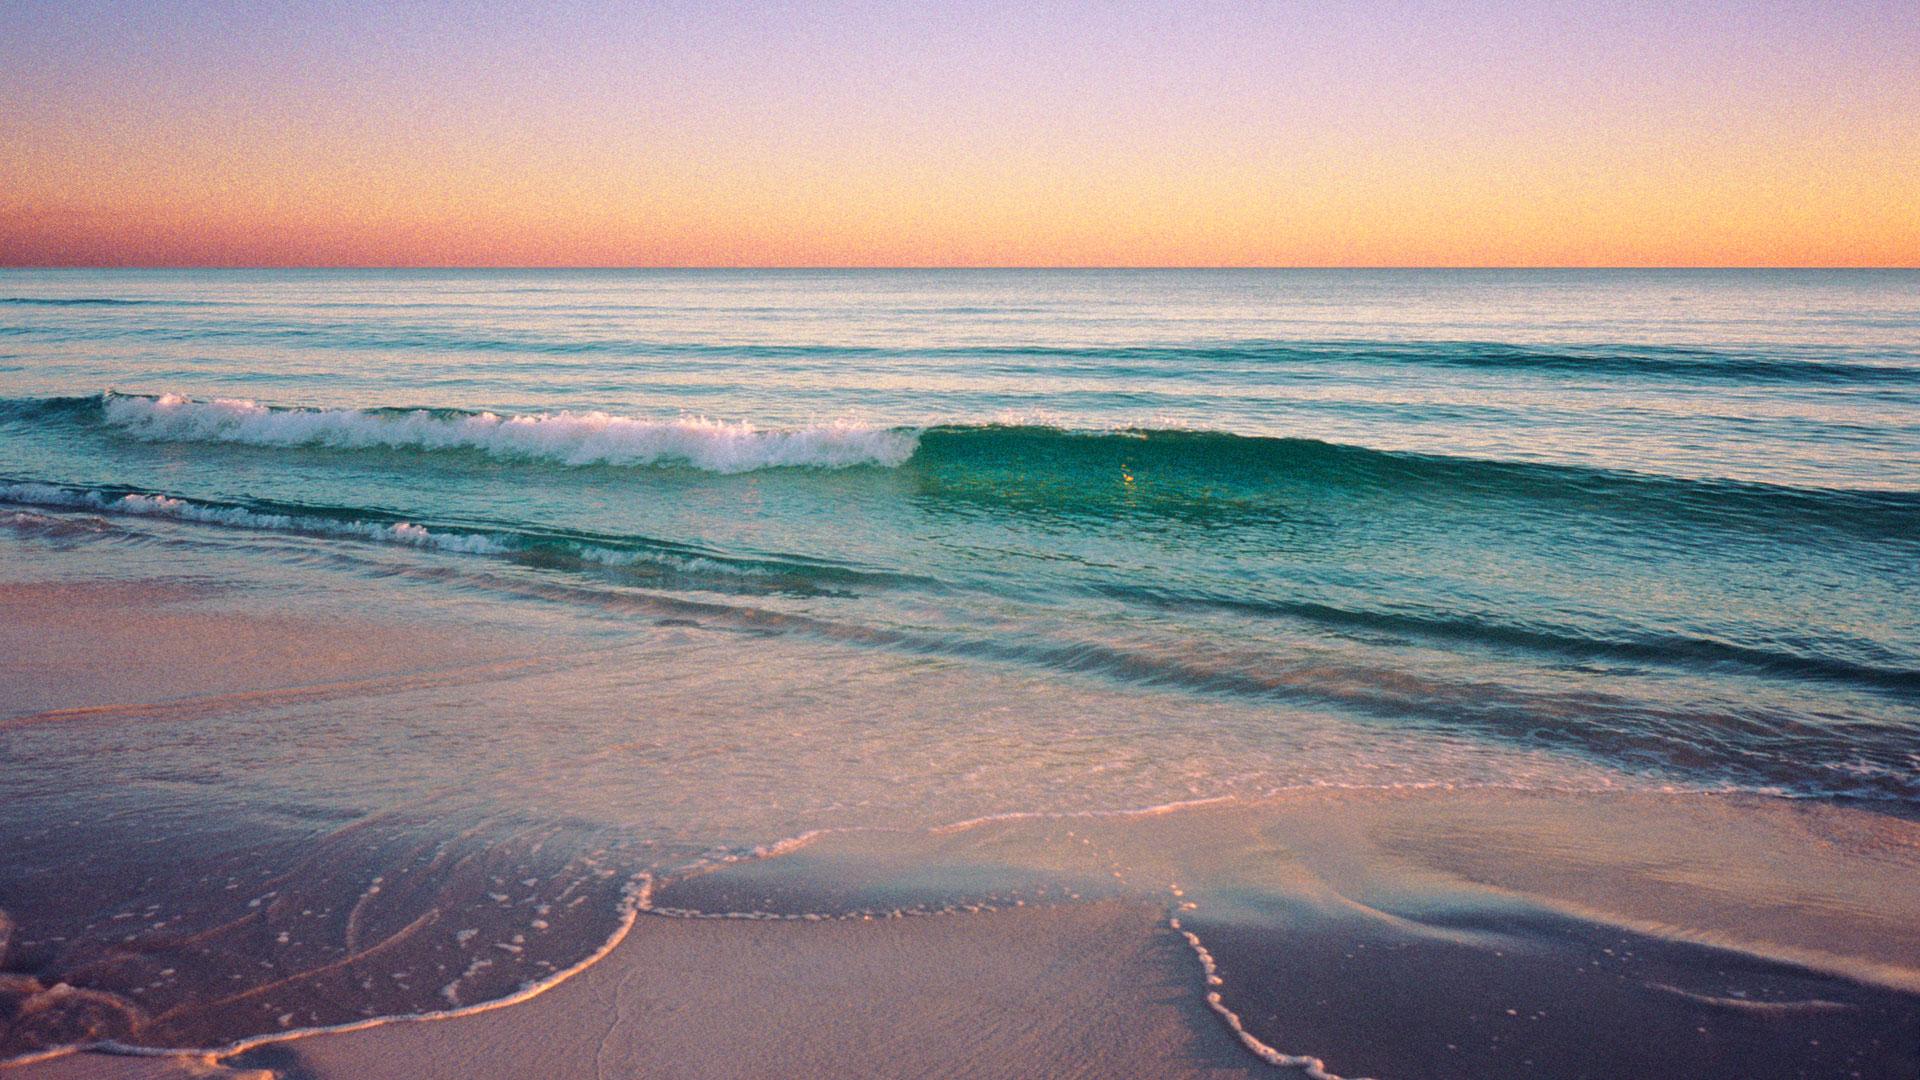 Emerald Beach Florida wallpaper   238884 1920x1080